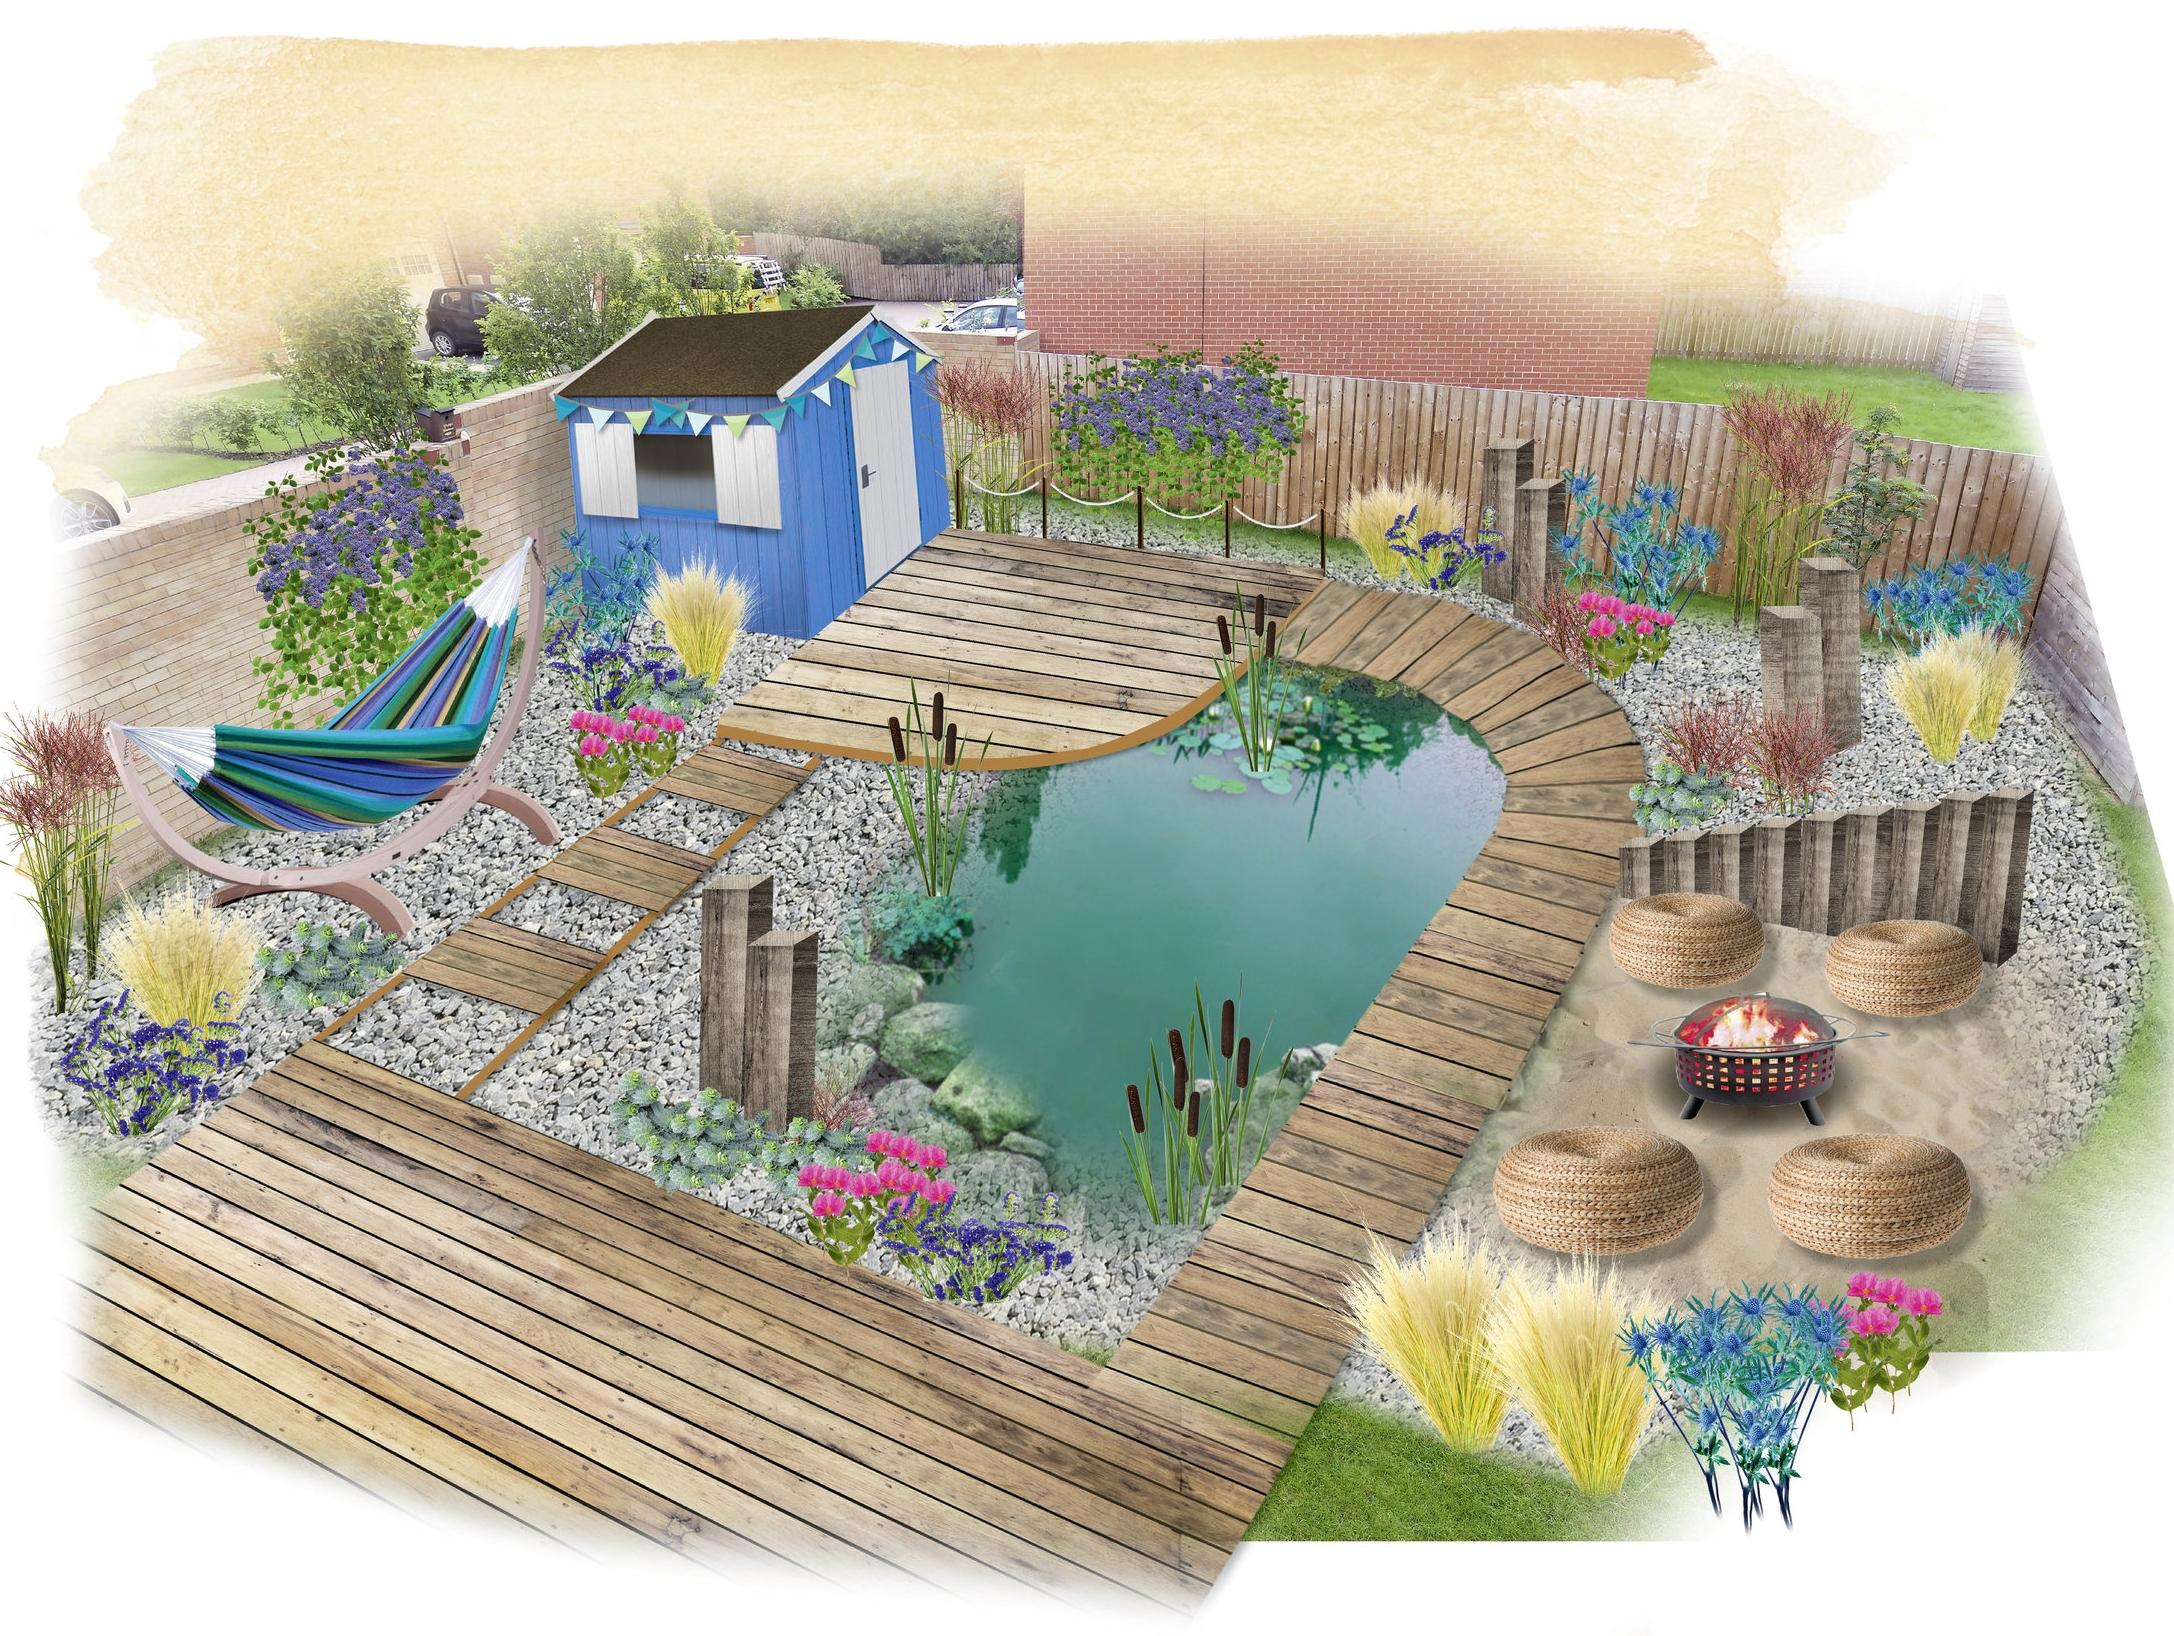 Seaside garden2.jpg